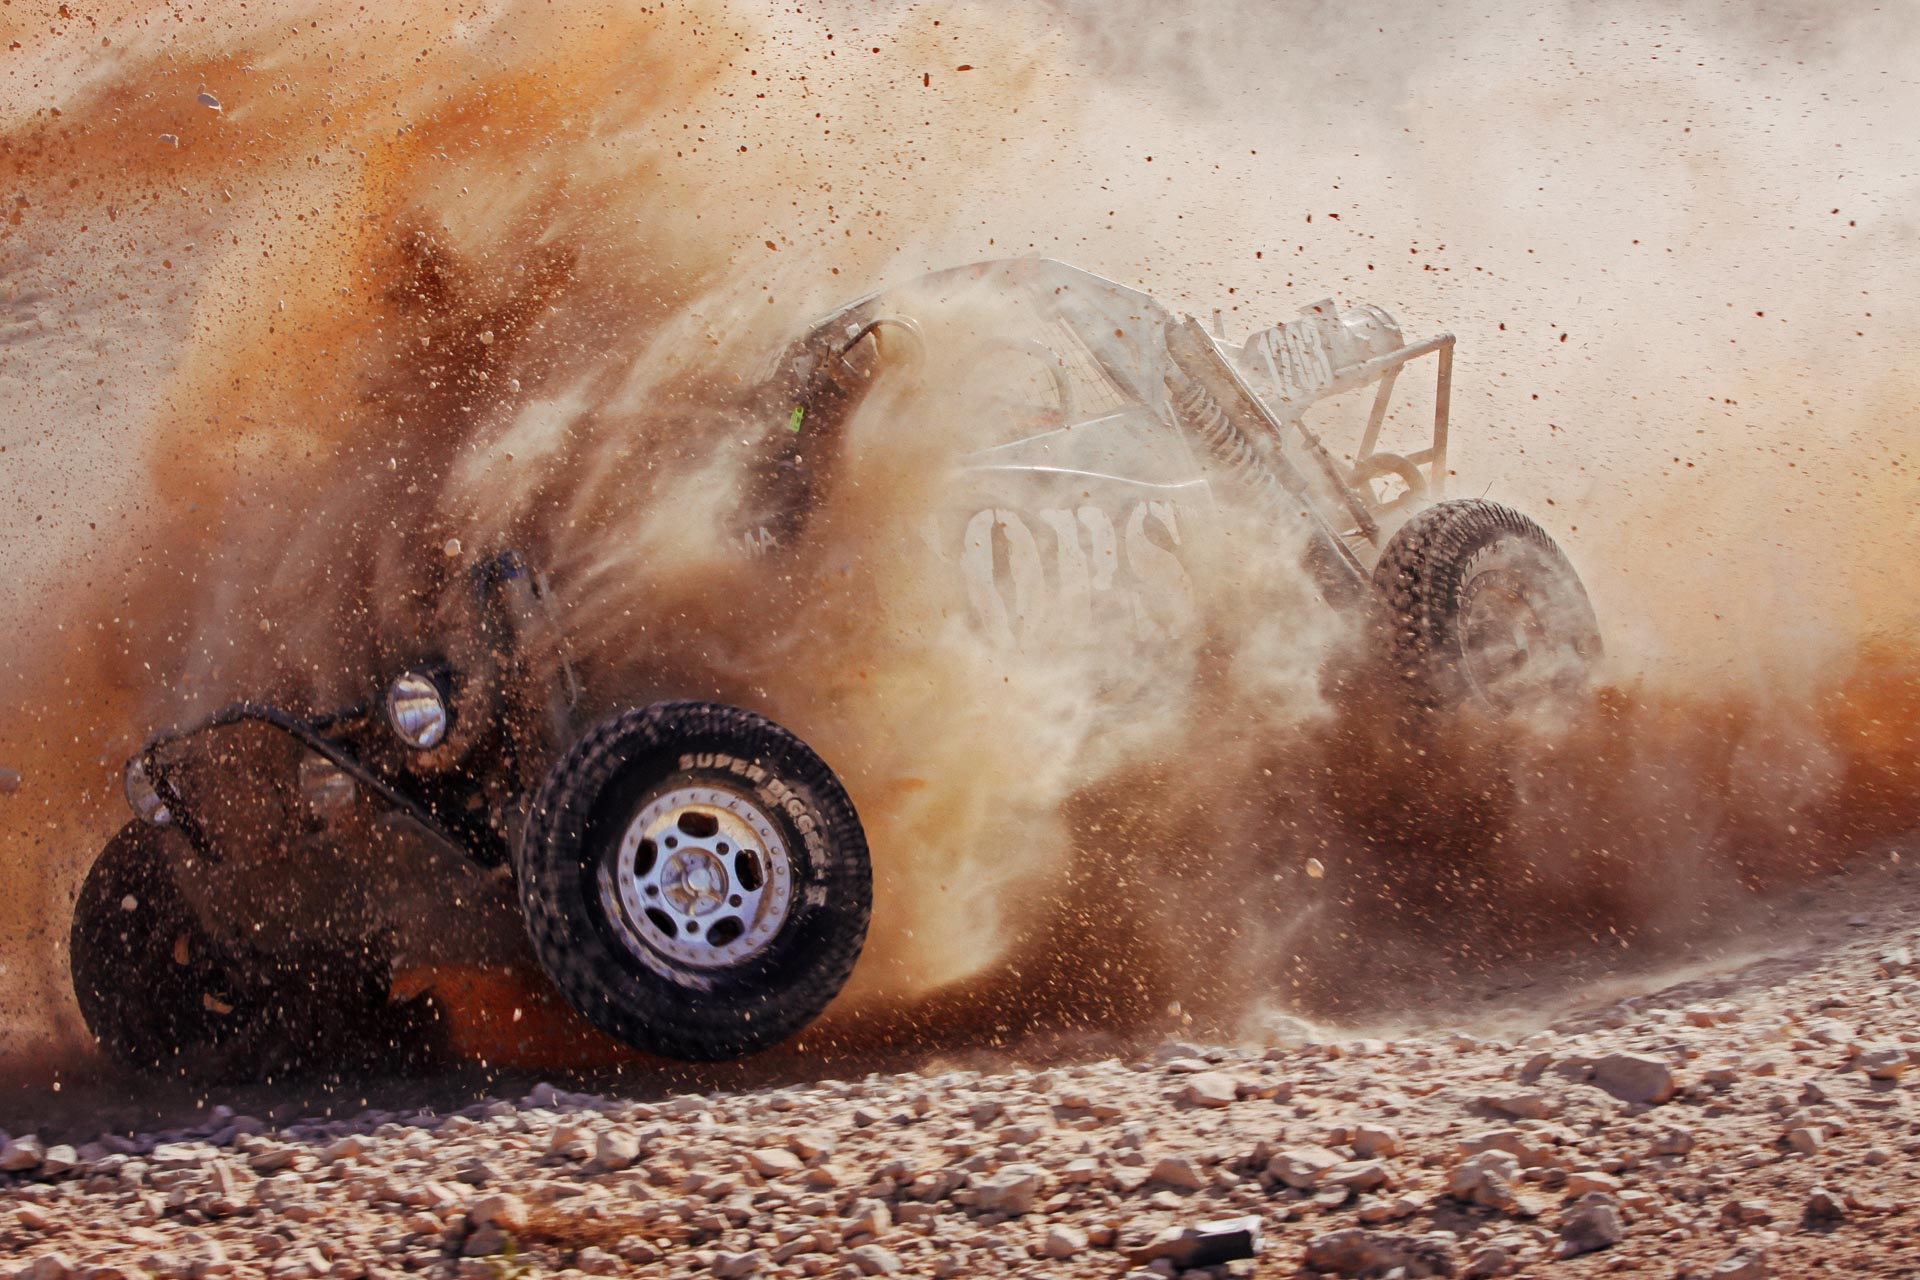 MINT 400 dust